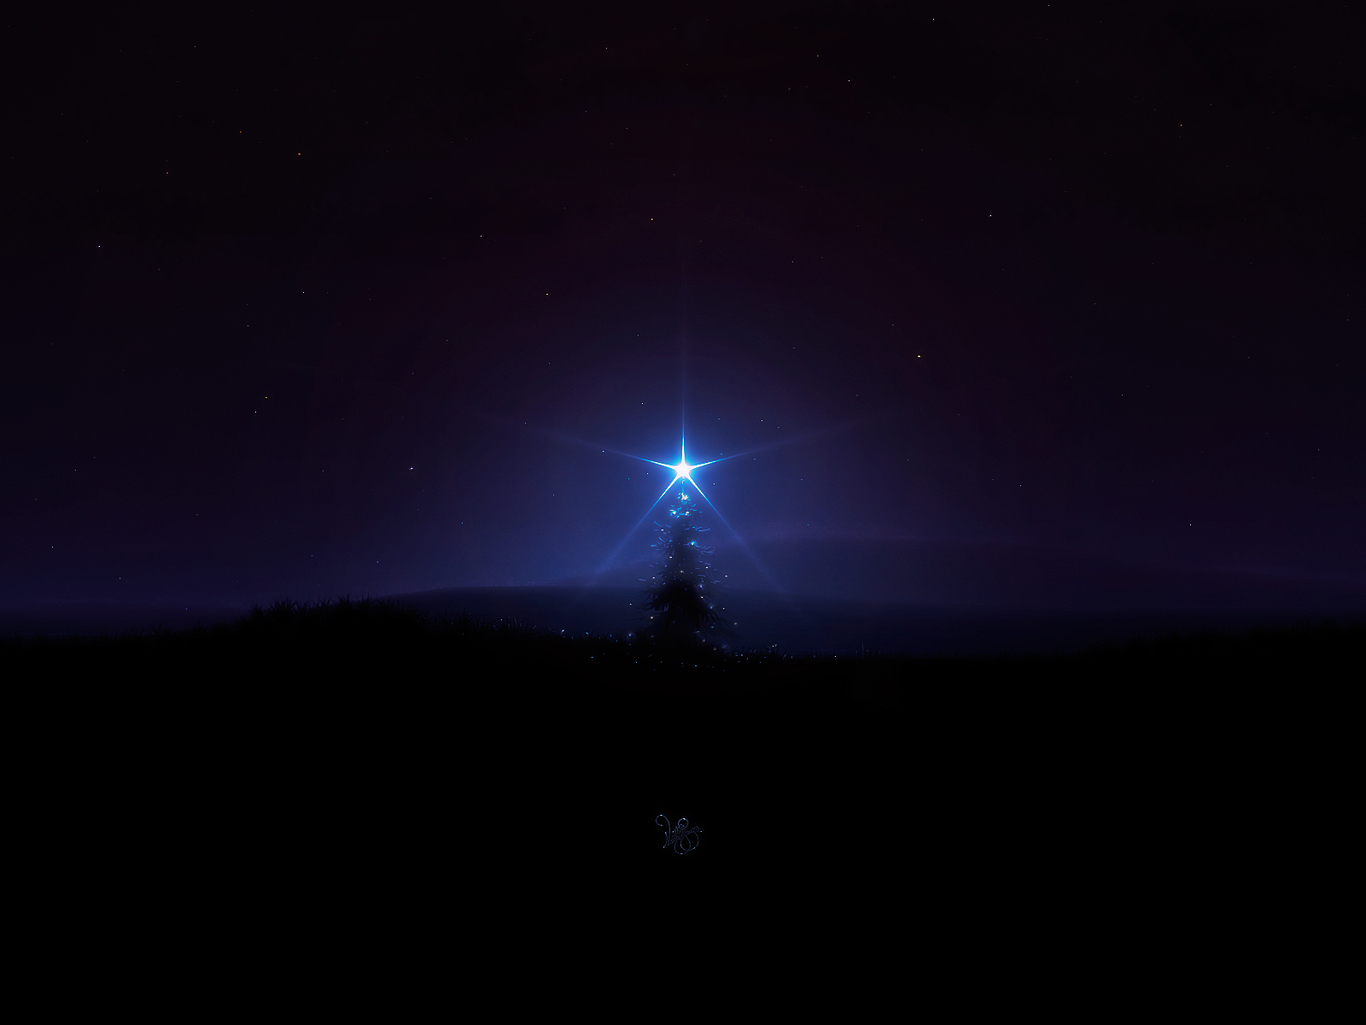 Nwiz25 magic of christmas 1 a41e0db4 8o1y